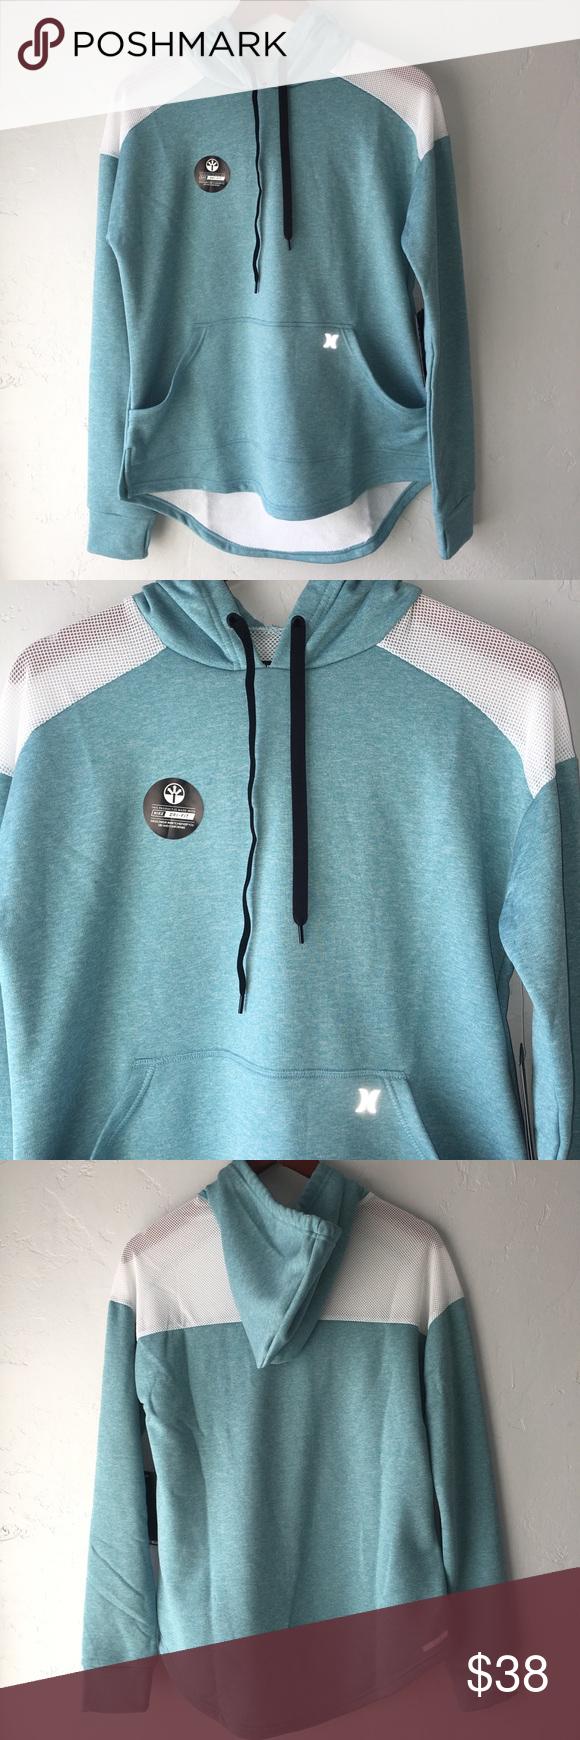 190169c50d42 Hurley Nike Dri Fit United Fleece Pullover Dri Fit United Fleece Pullover.  Hooded with adjustable